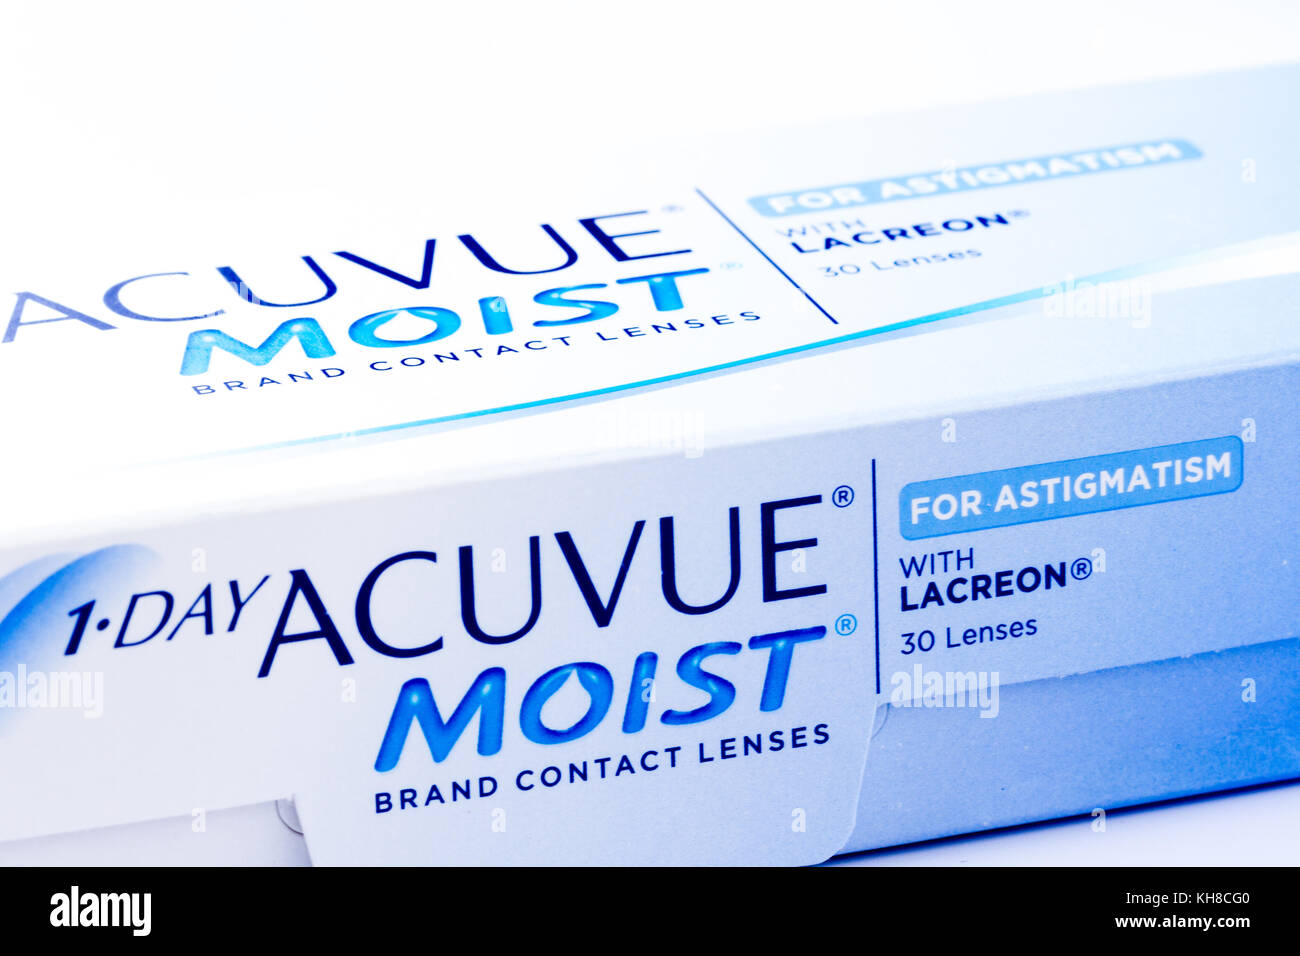 e03d6e8ed6c08 Cerca de una caja de 1-DAY ACUVUE MOIST lentes de contacto desechables  diarias para el astigmatismo, Reino Unido